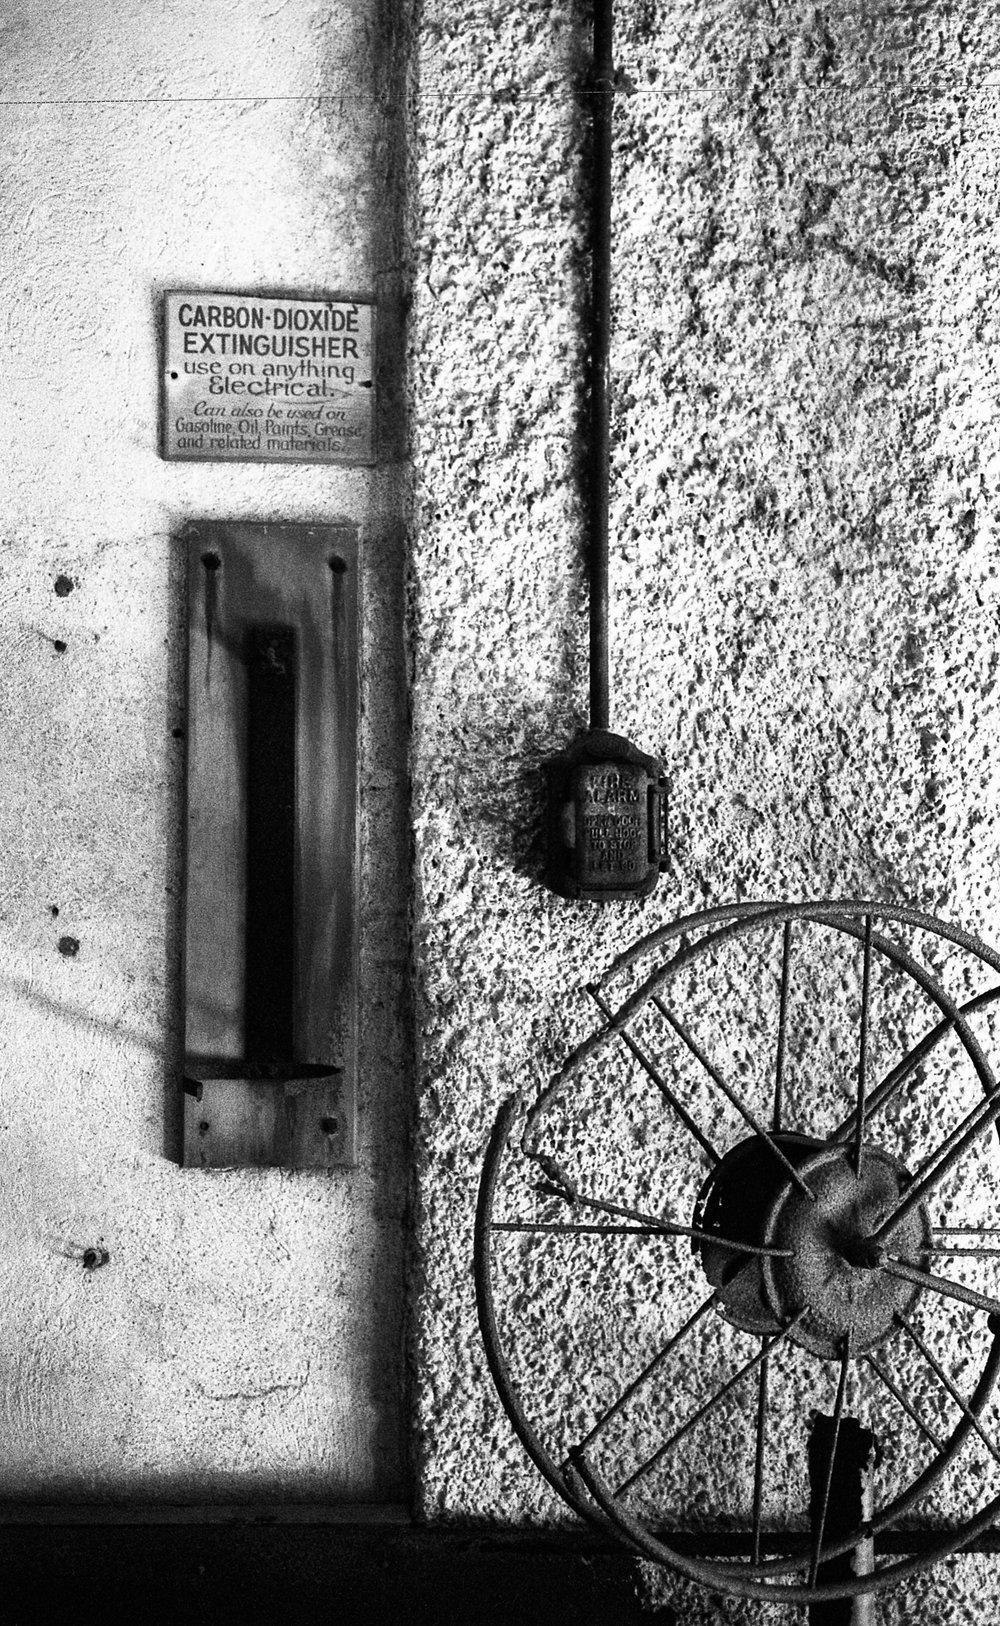 Leica M6 - Kodak Tri-X 400